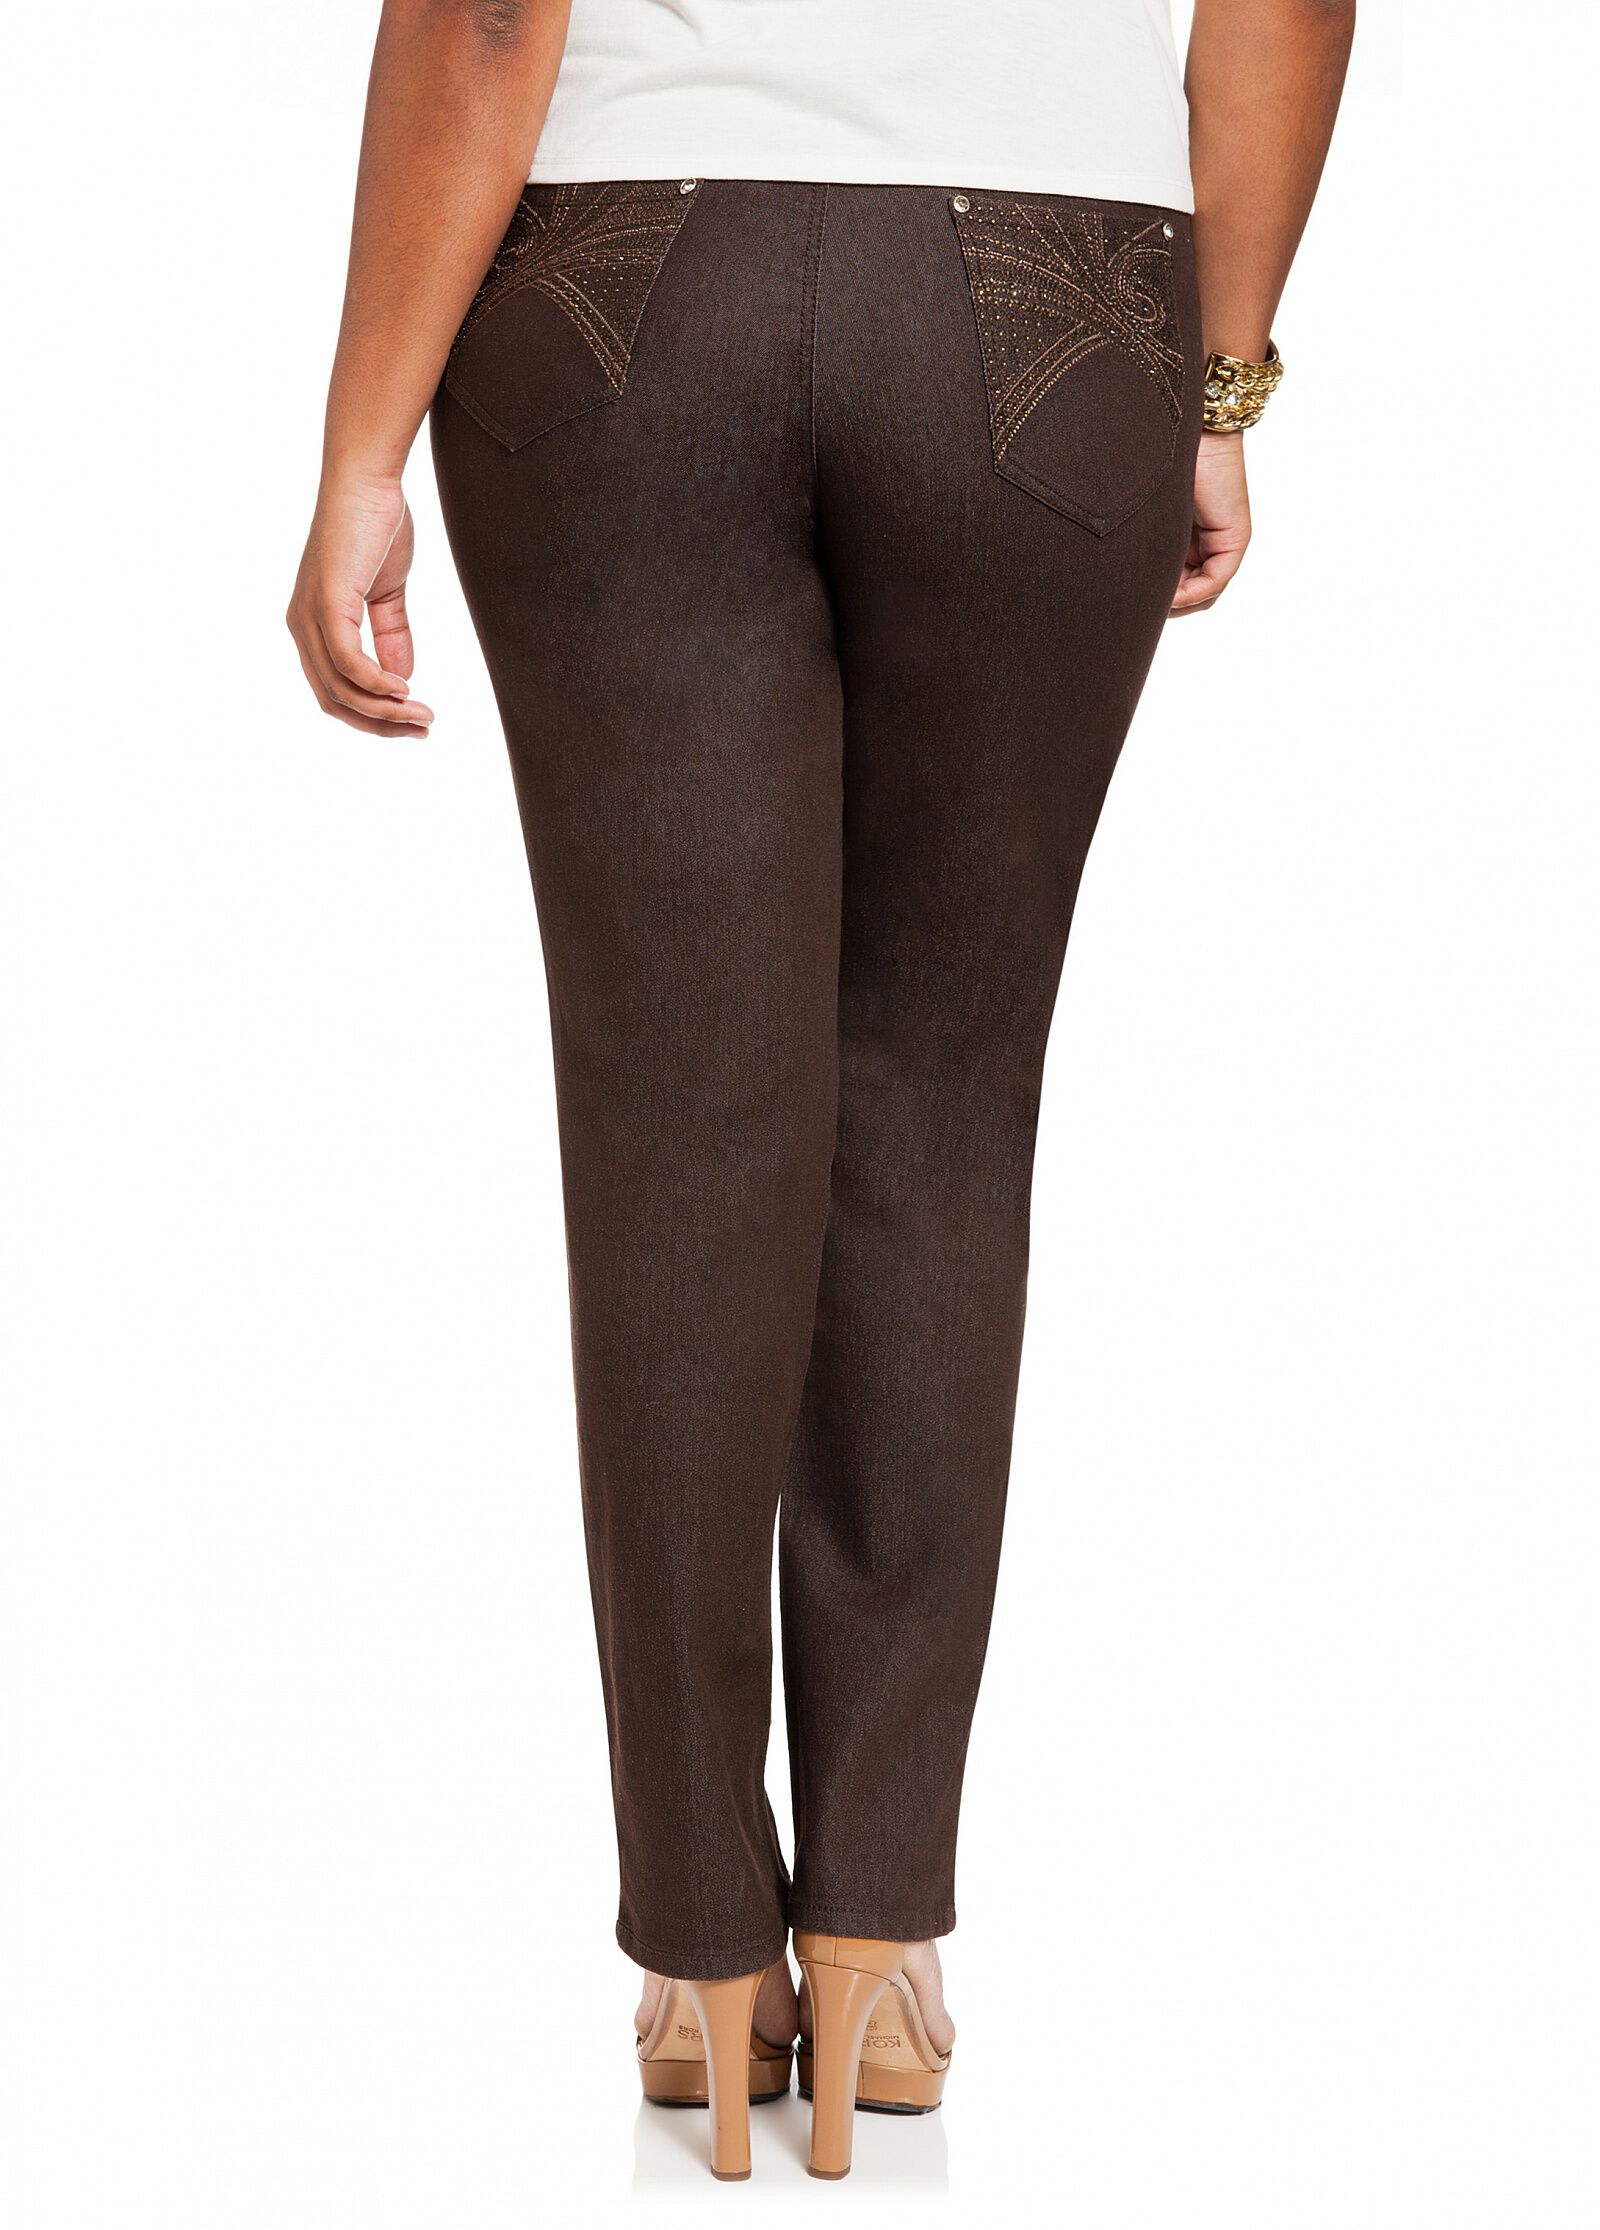 Plus Size Embellished Jeans zF5Q1zfK